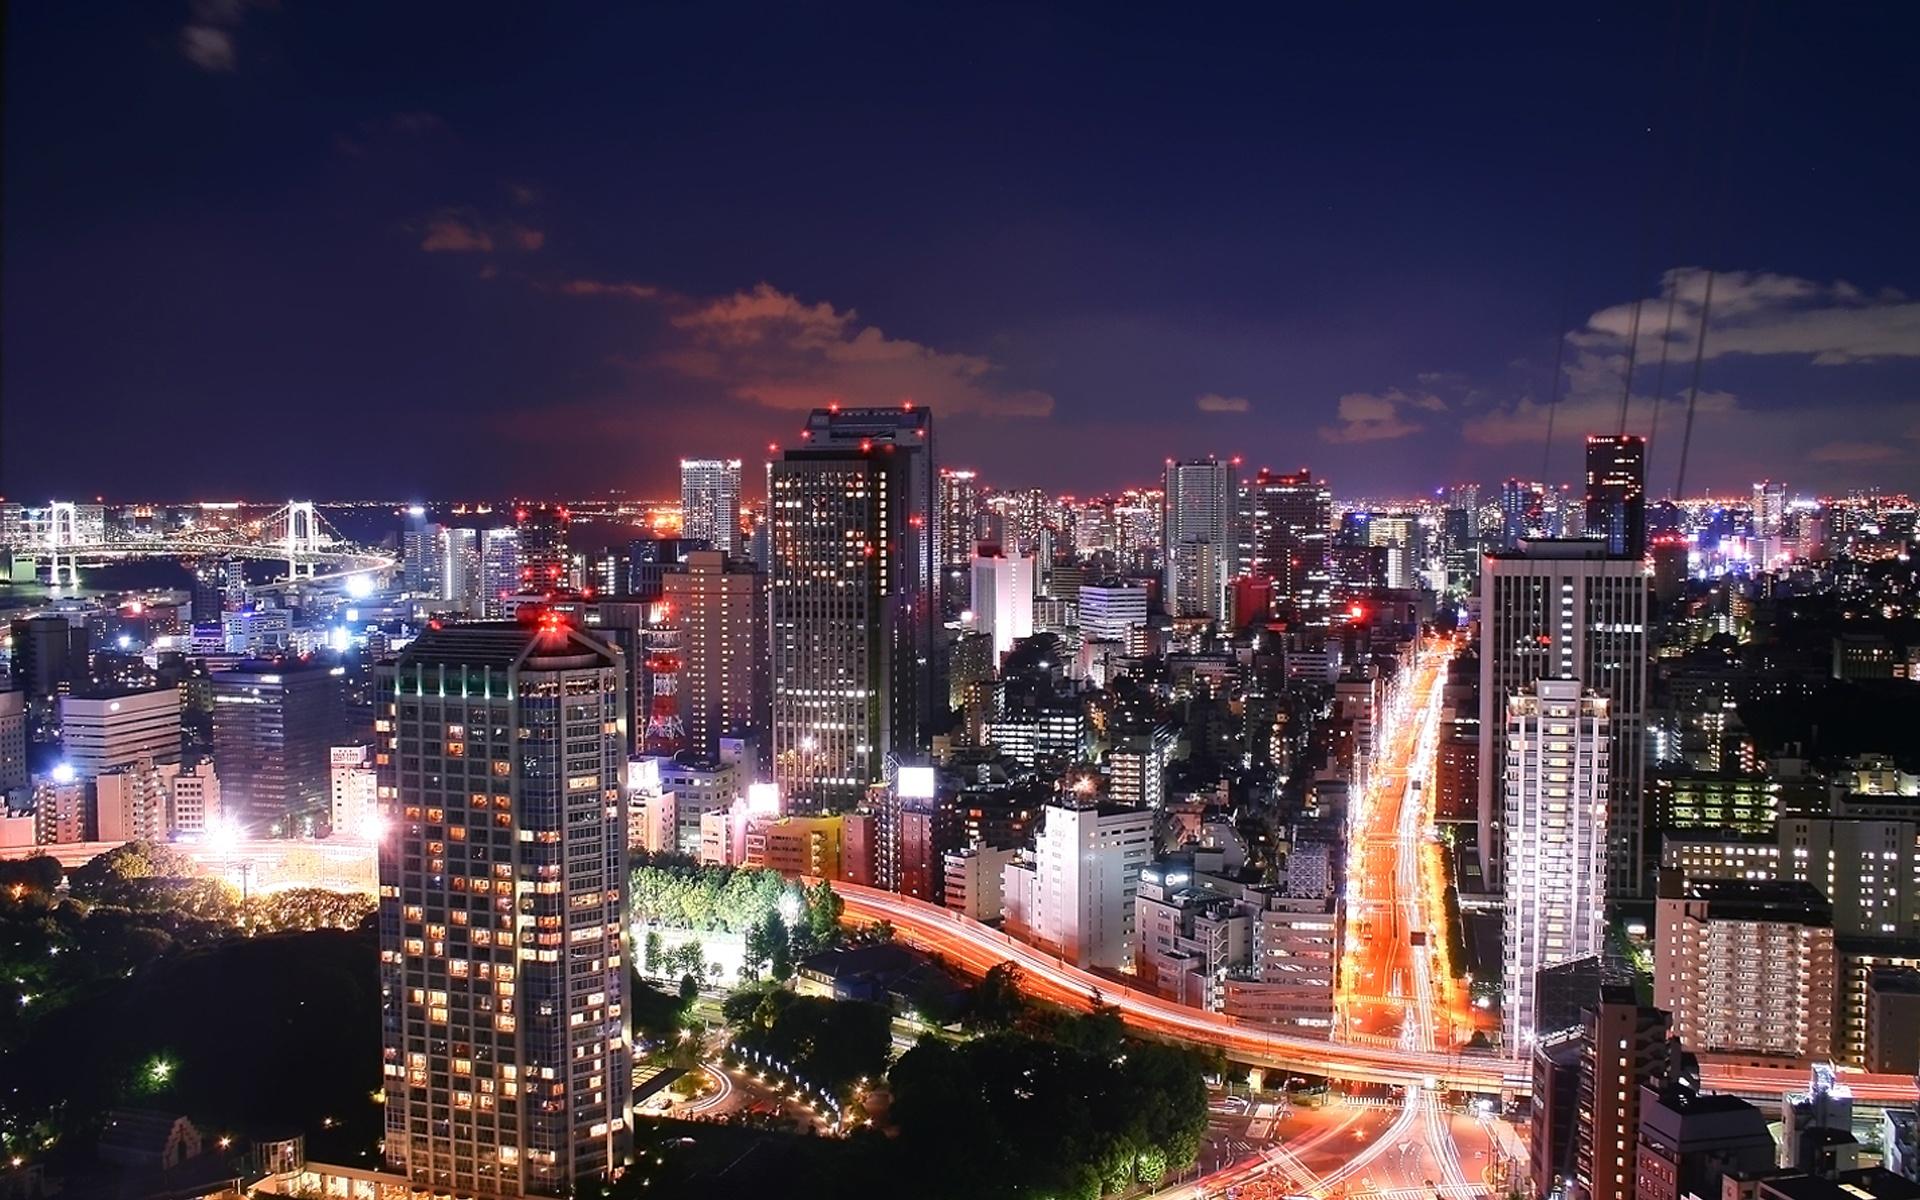 Tokyo City Night Wallpapers   1920x1200   820918 1920x1200